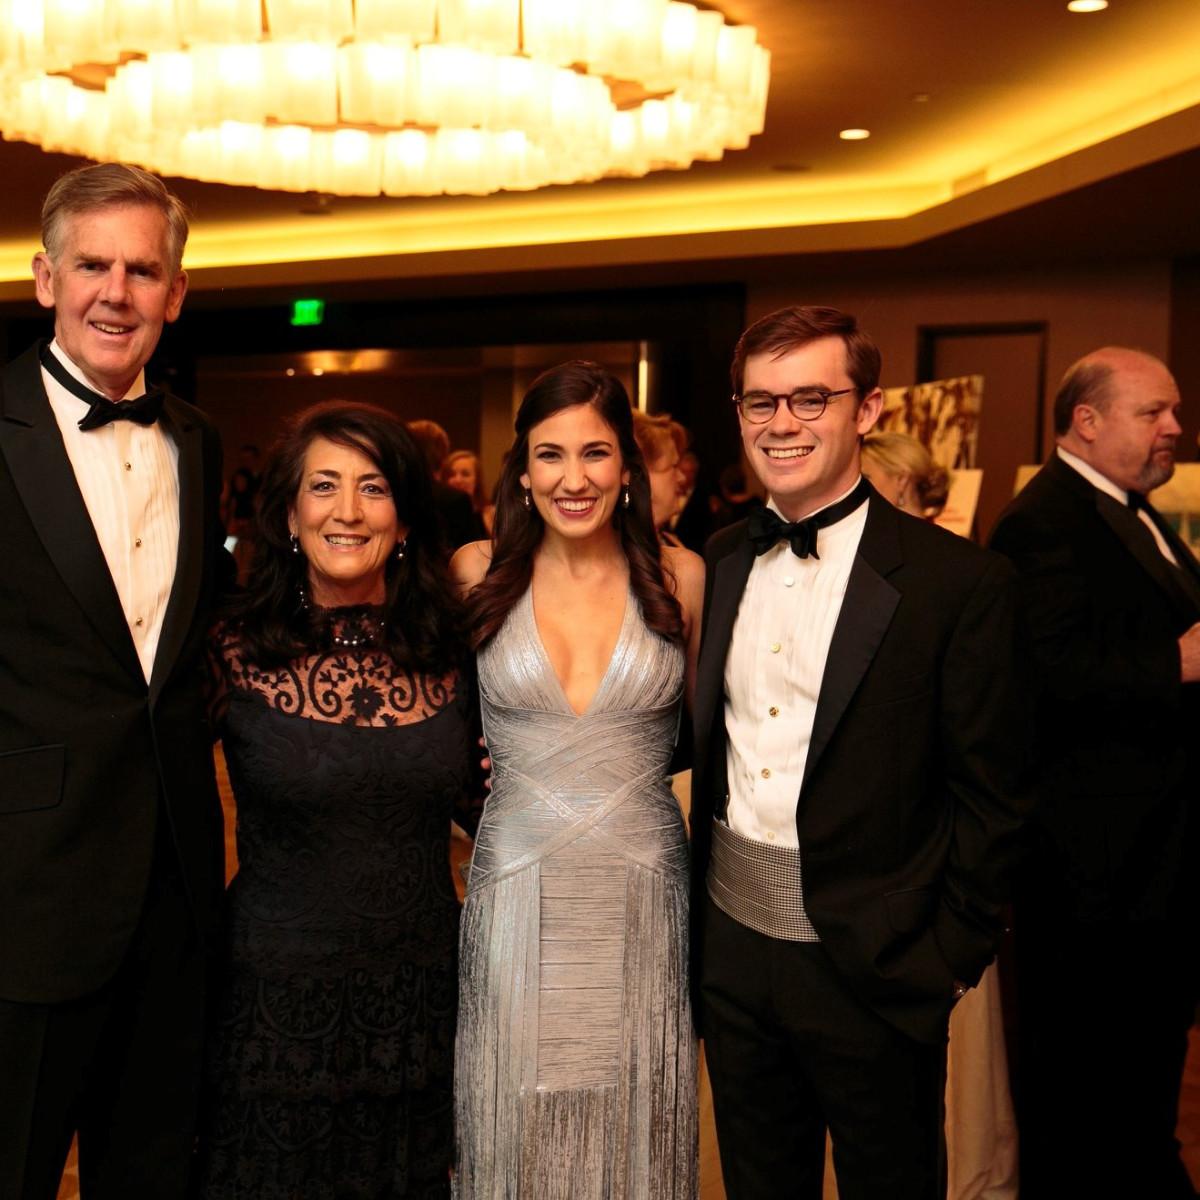 Robert and Debra Hitzelberger, DSOL President Kay Hitzelberger and Stuart R. Duenner, Slipper Club Havana Nights 2018